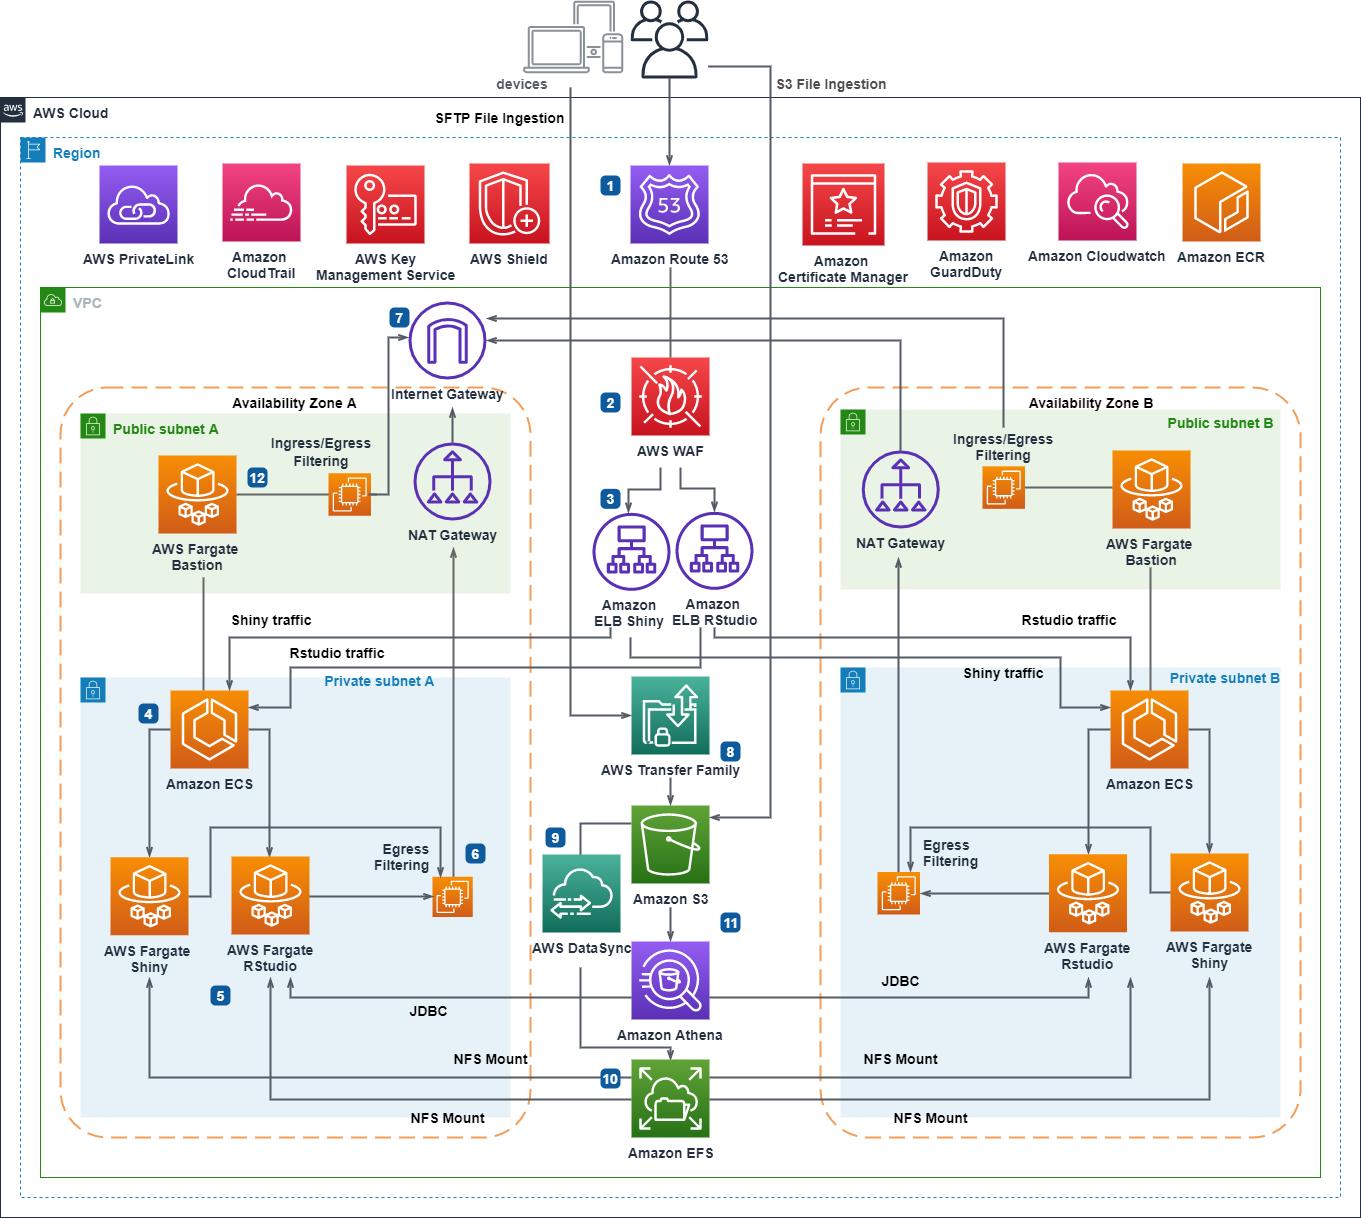 RStudio-Shiny Open Source Deployment on AWS Serverless Infrastructure